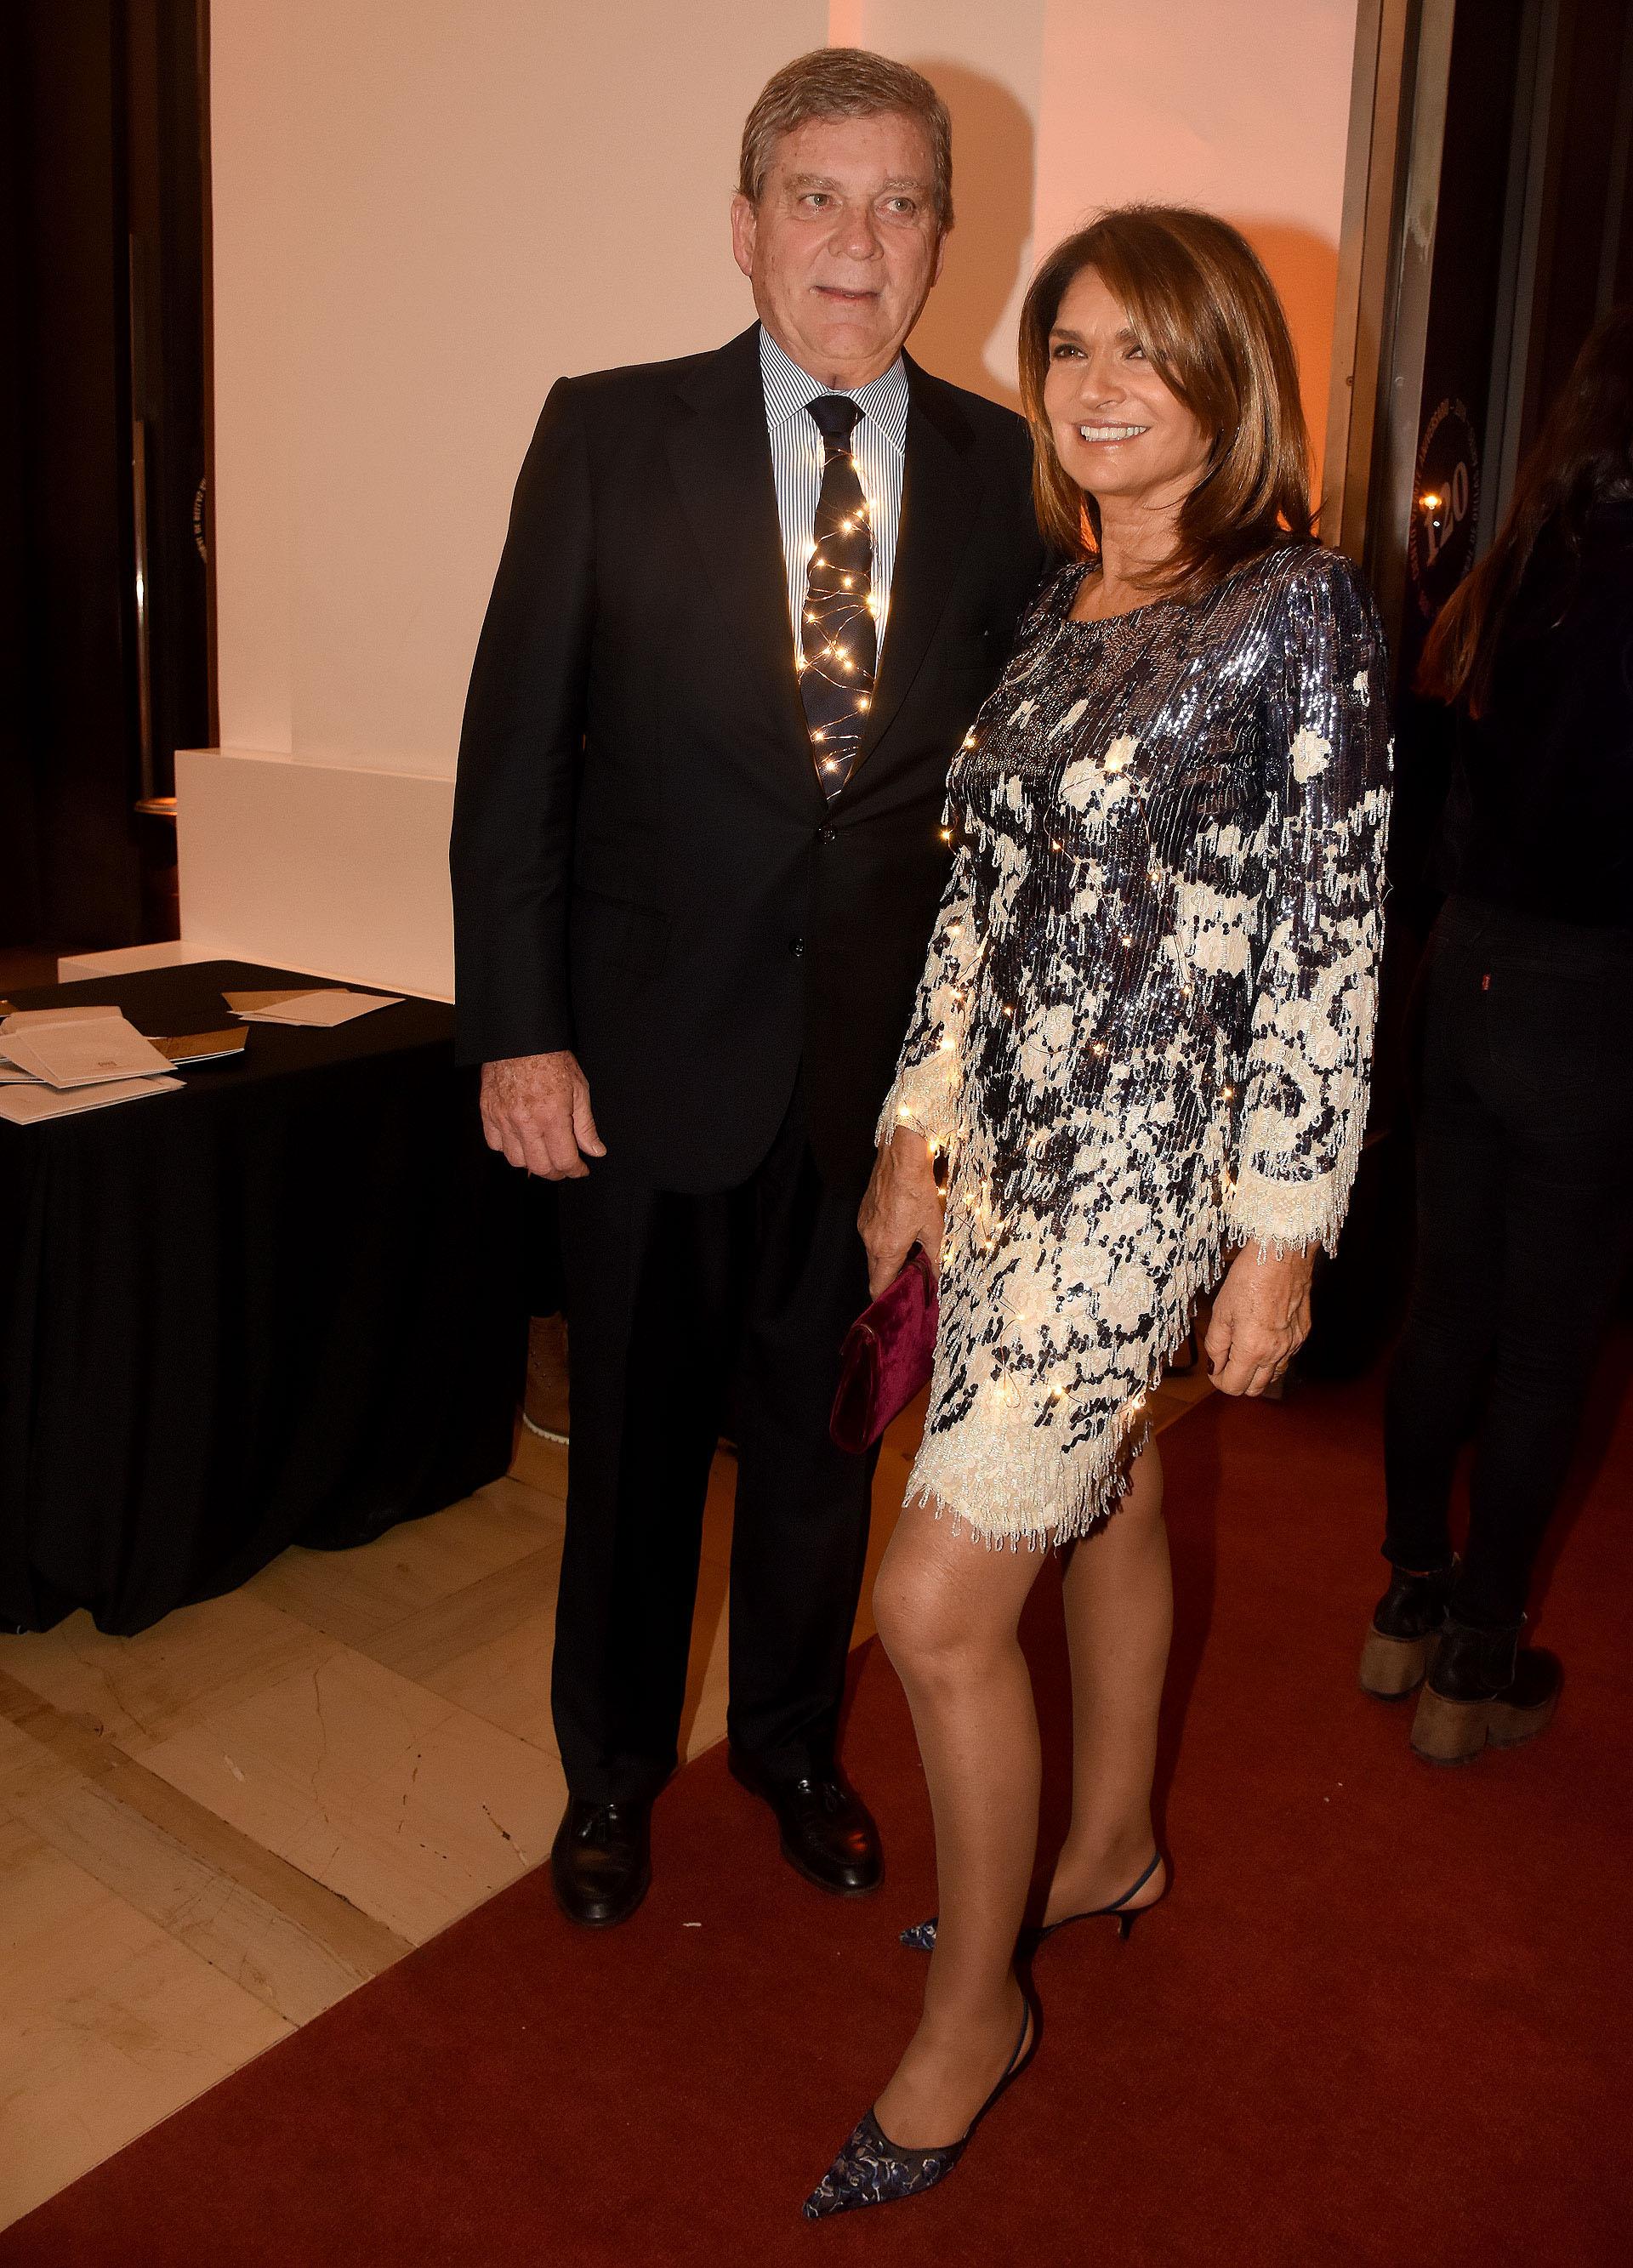 Gonzalo Bergadá y Teresa Calandra